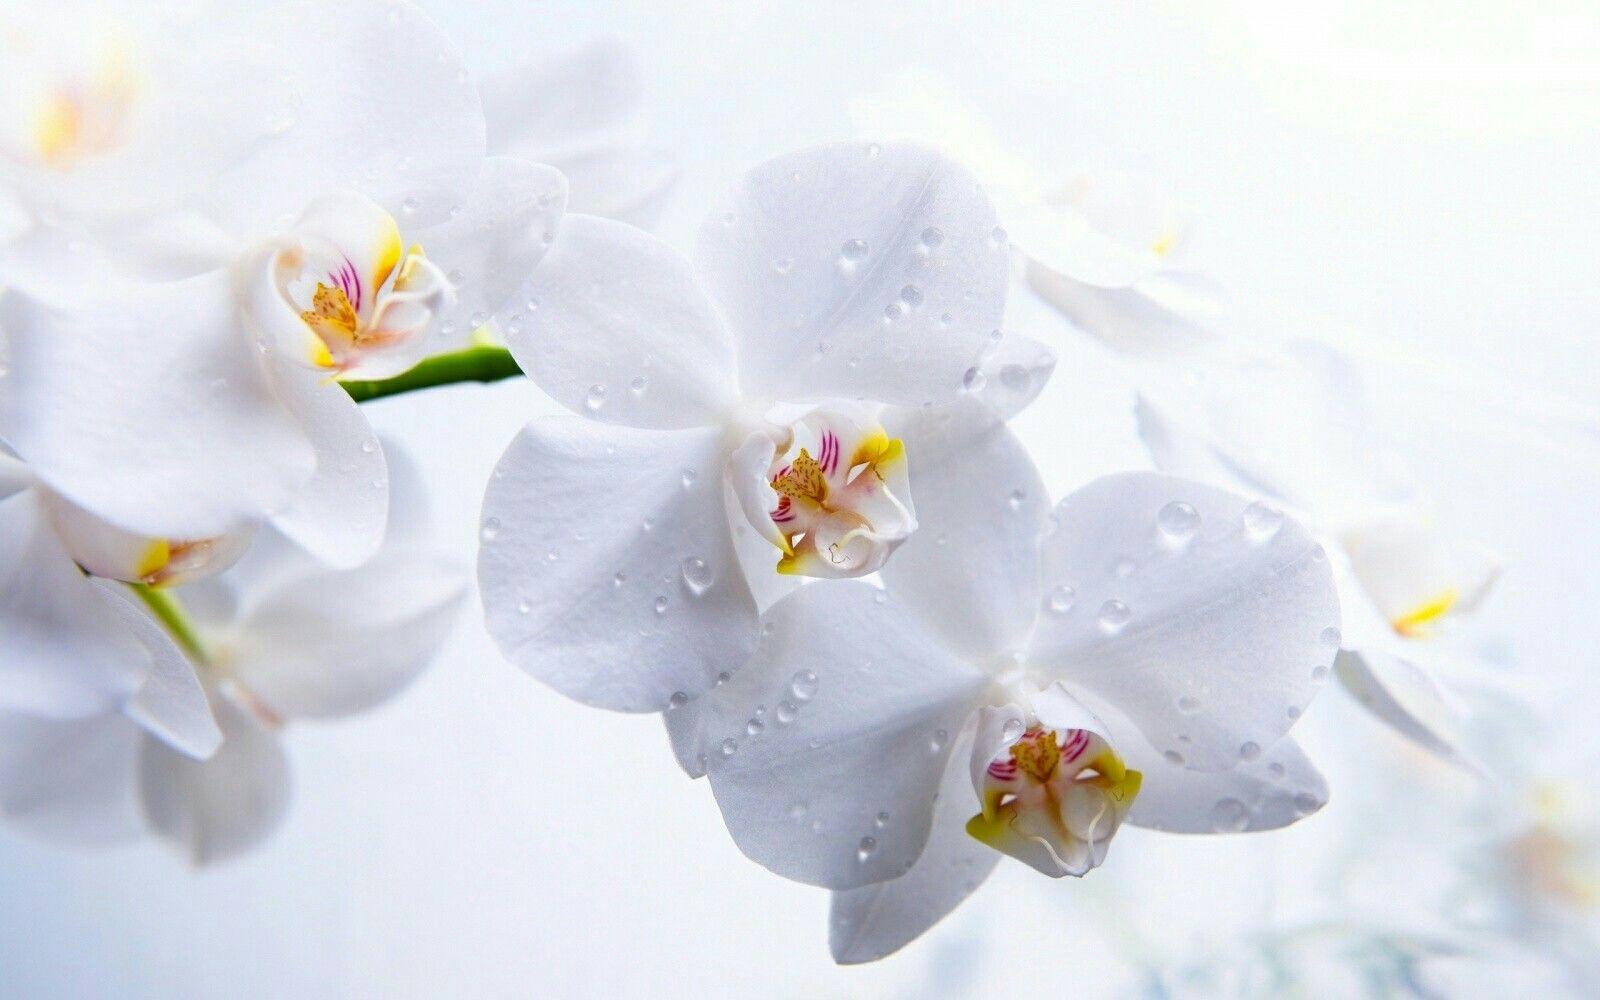 Hd wallpapers backgrounds white u green flowers pinterest